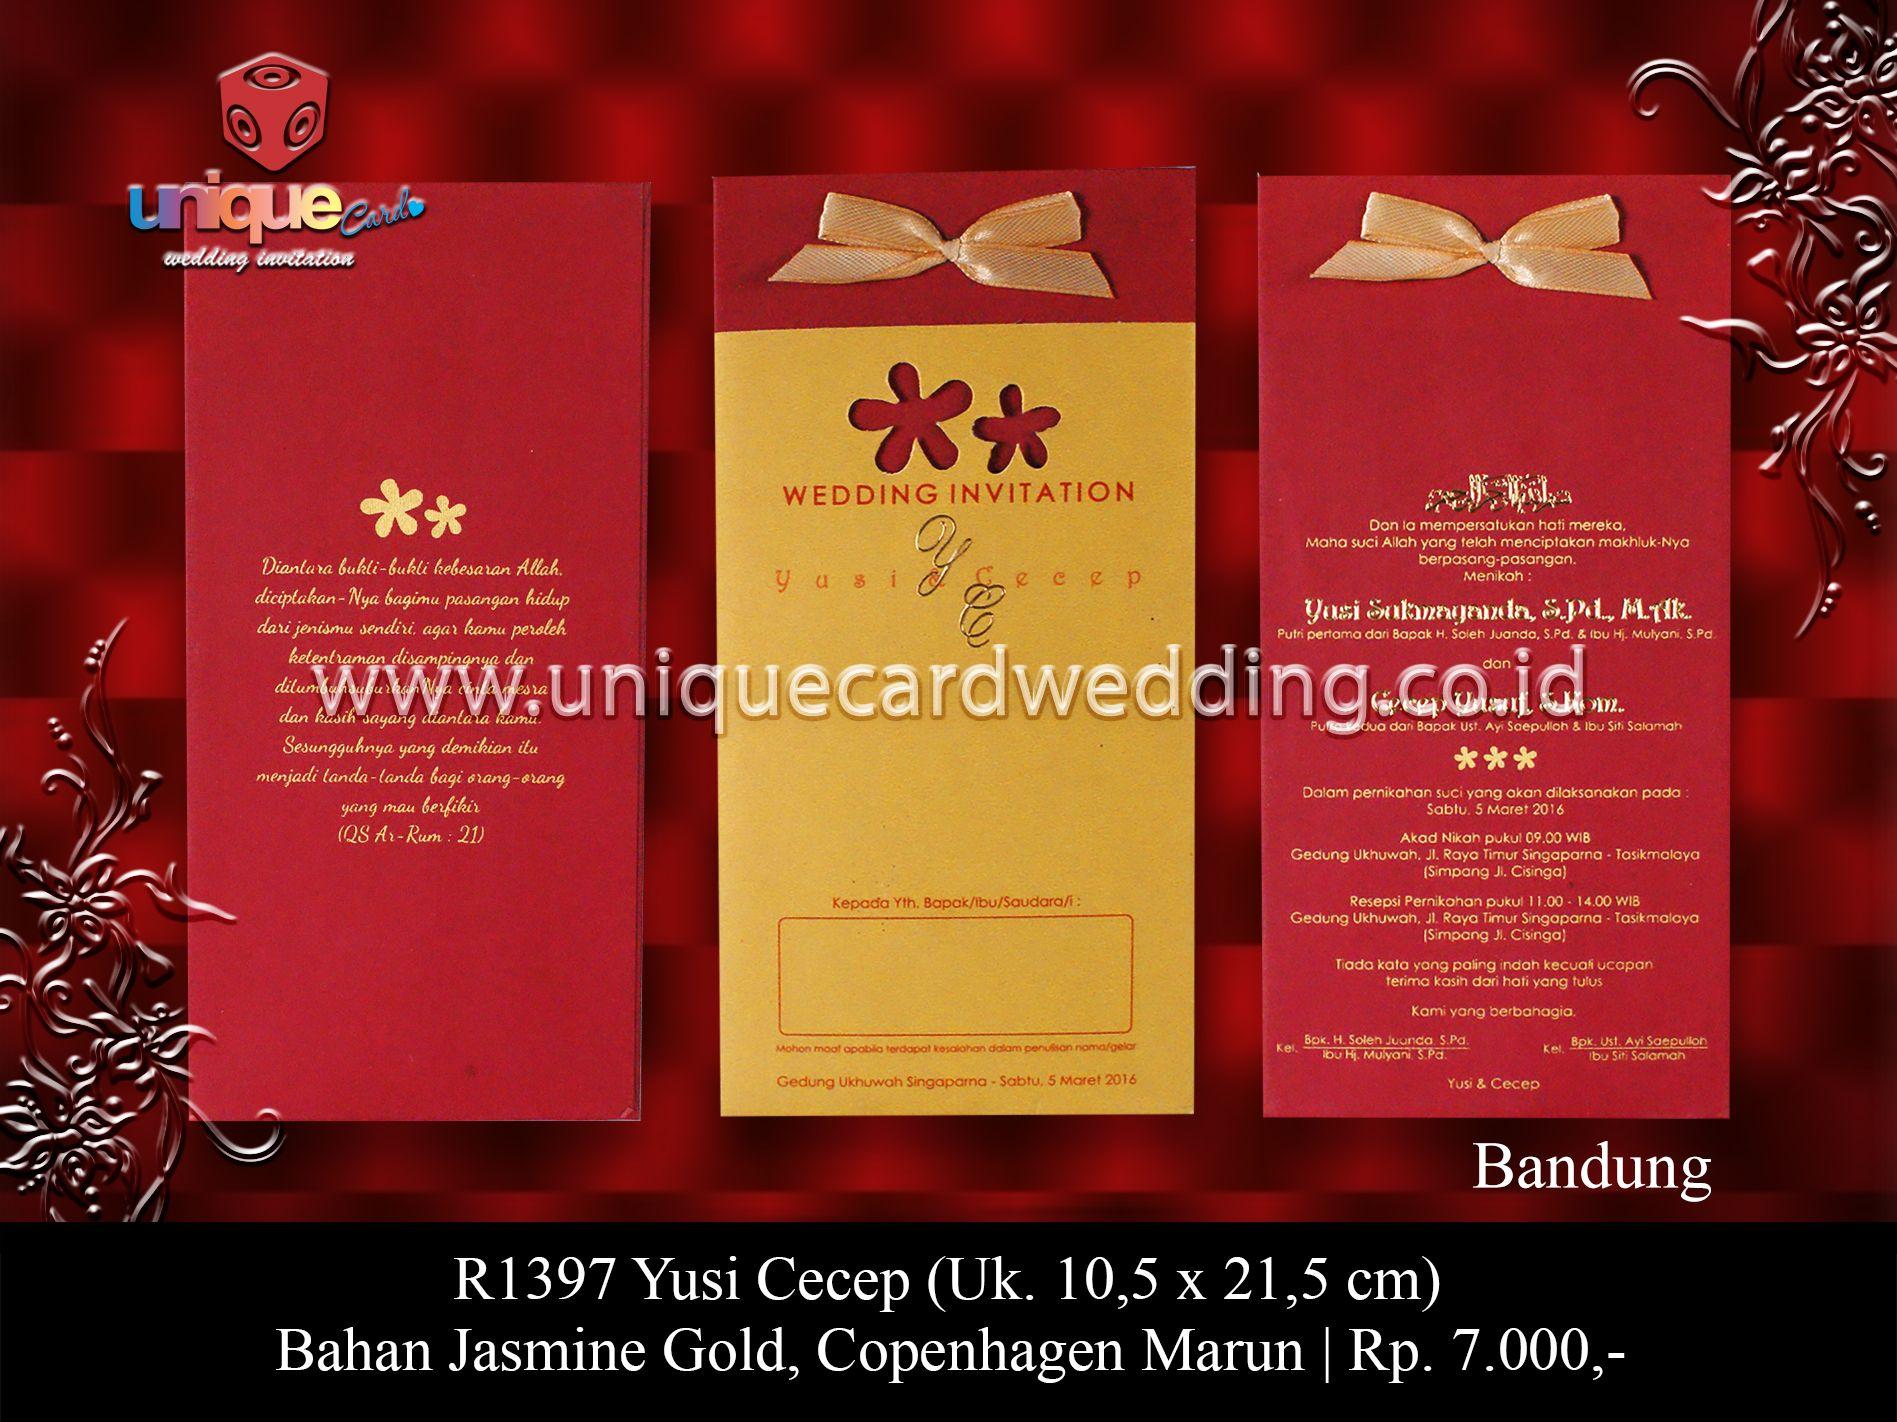 unique card wedding invitation Bandung-West java. Indonesia + ...